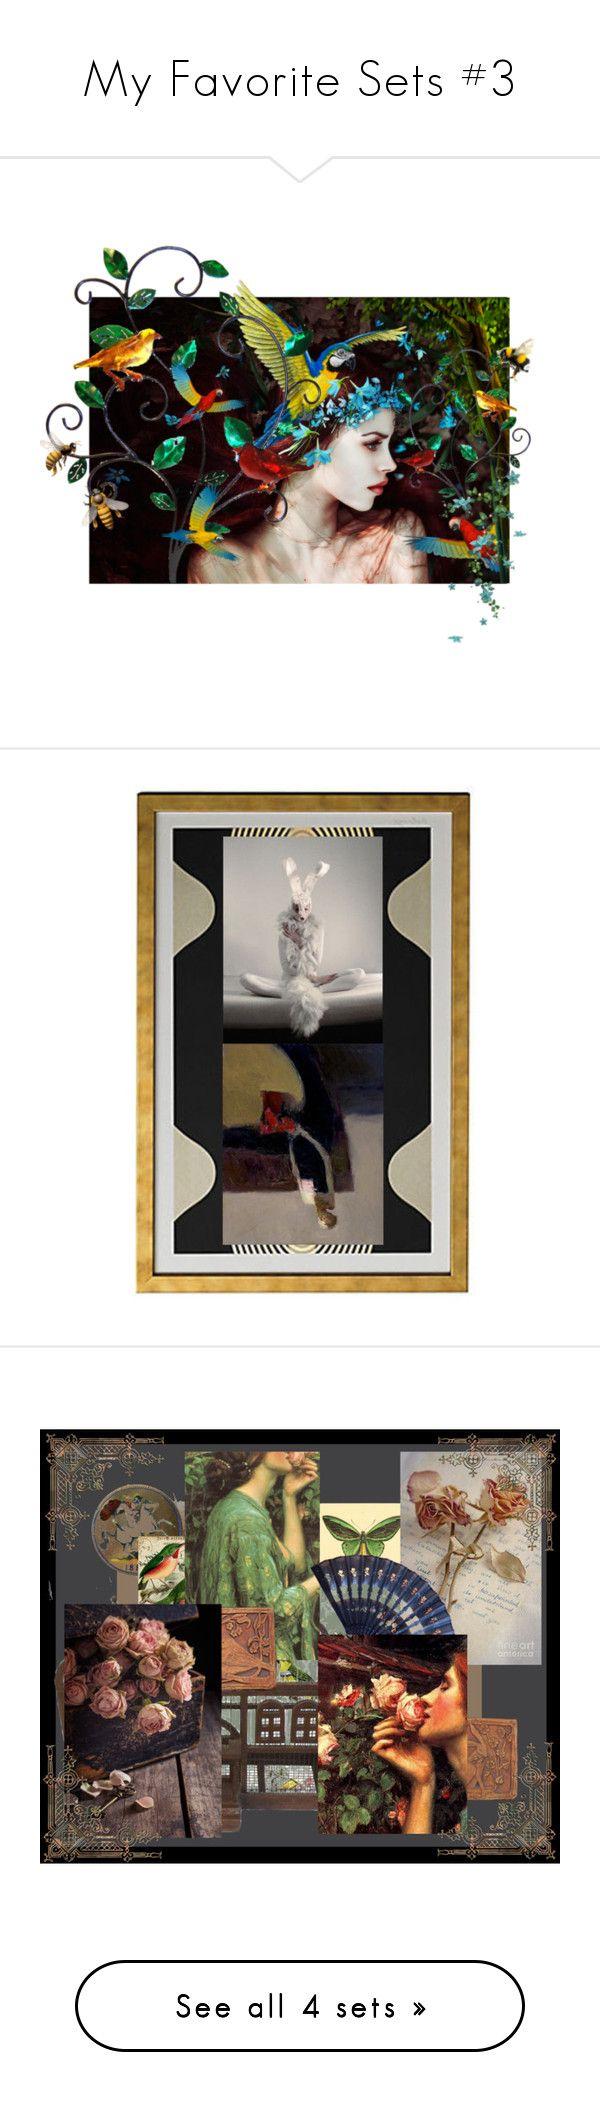 """My Favorite Sets #3"" by chilirose-creative ❤ liked on Polyvore featuring art, artset, artexpression, etsyflashmob, artflashmob27, bunnywoman, vintage, JohnWilliamWaterhouse, etsyevolution and muskrosevintage"